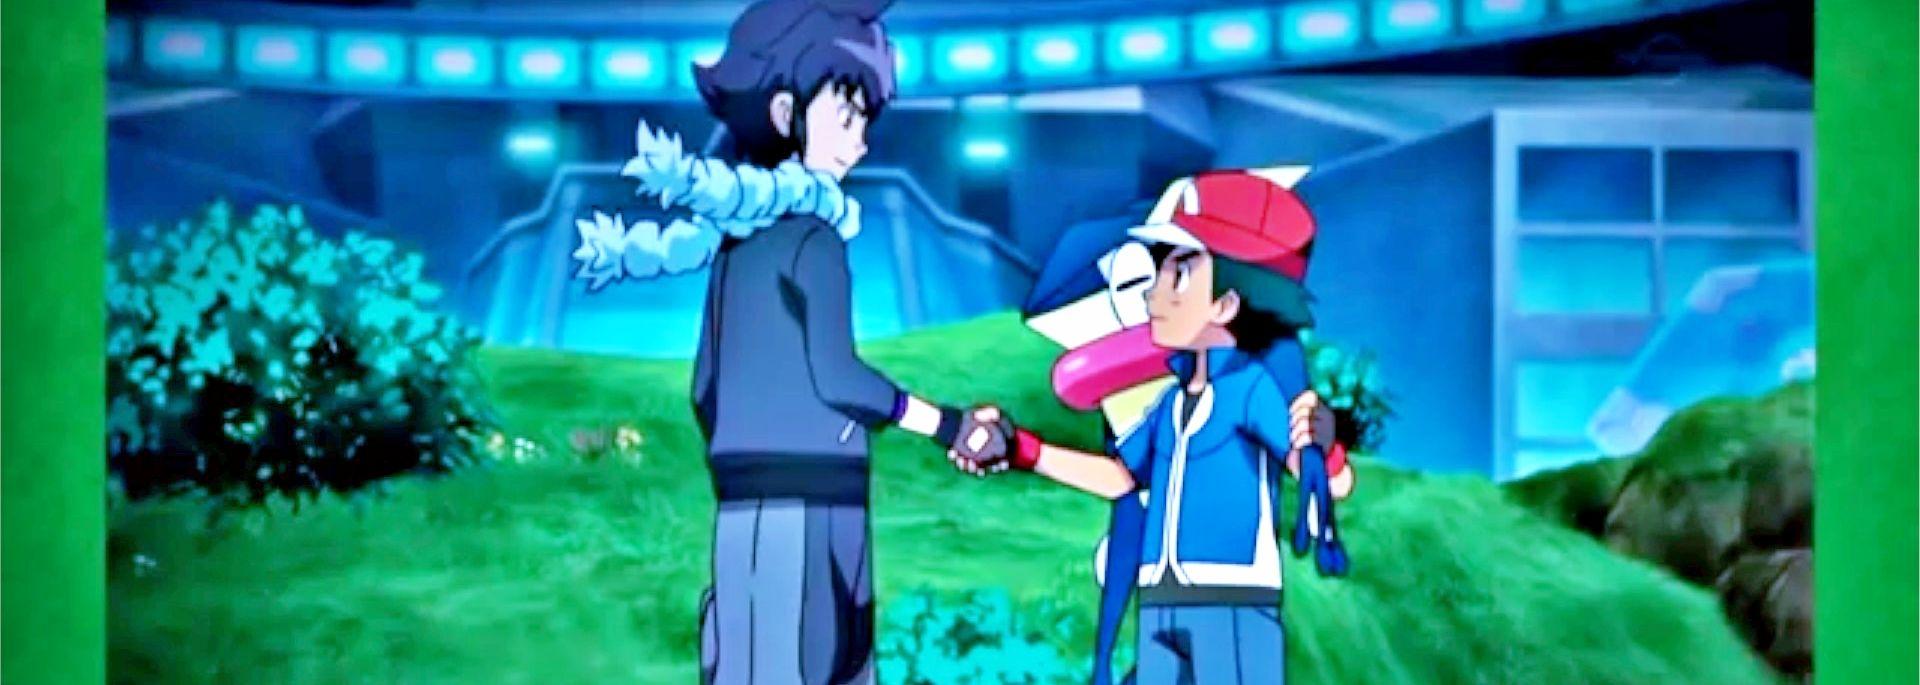 Pokemon Source channel